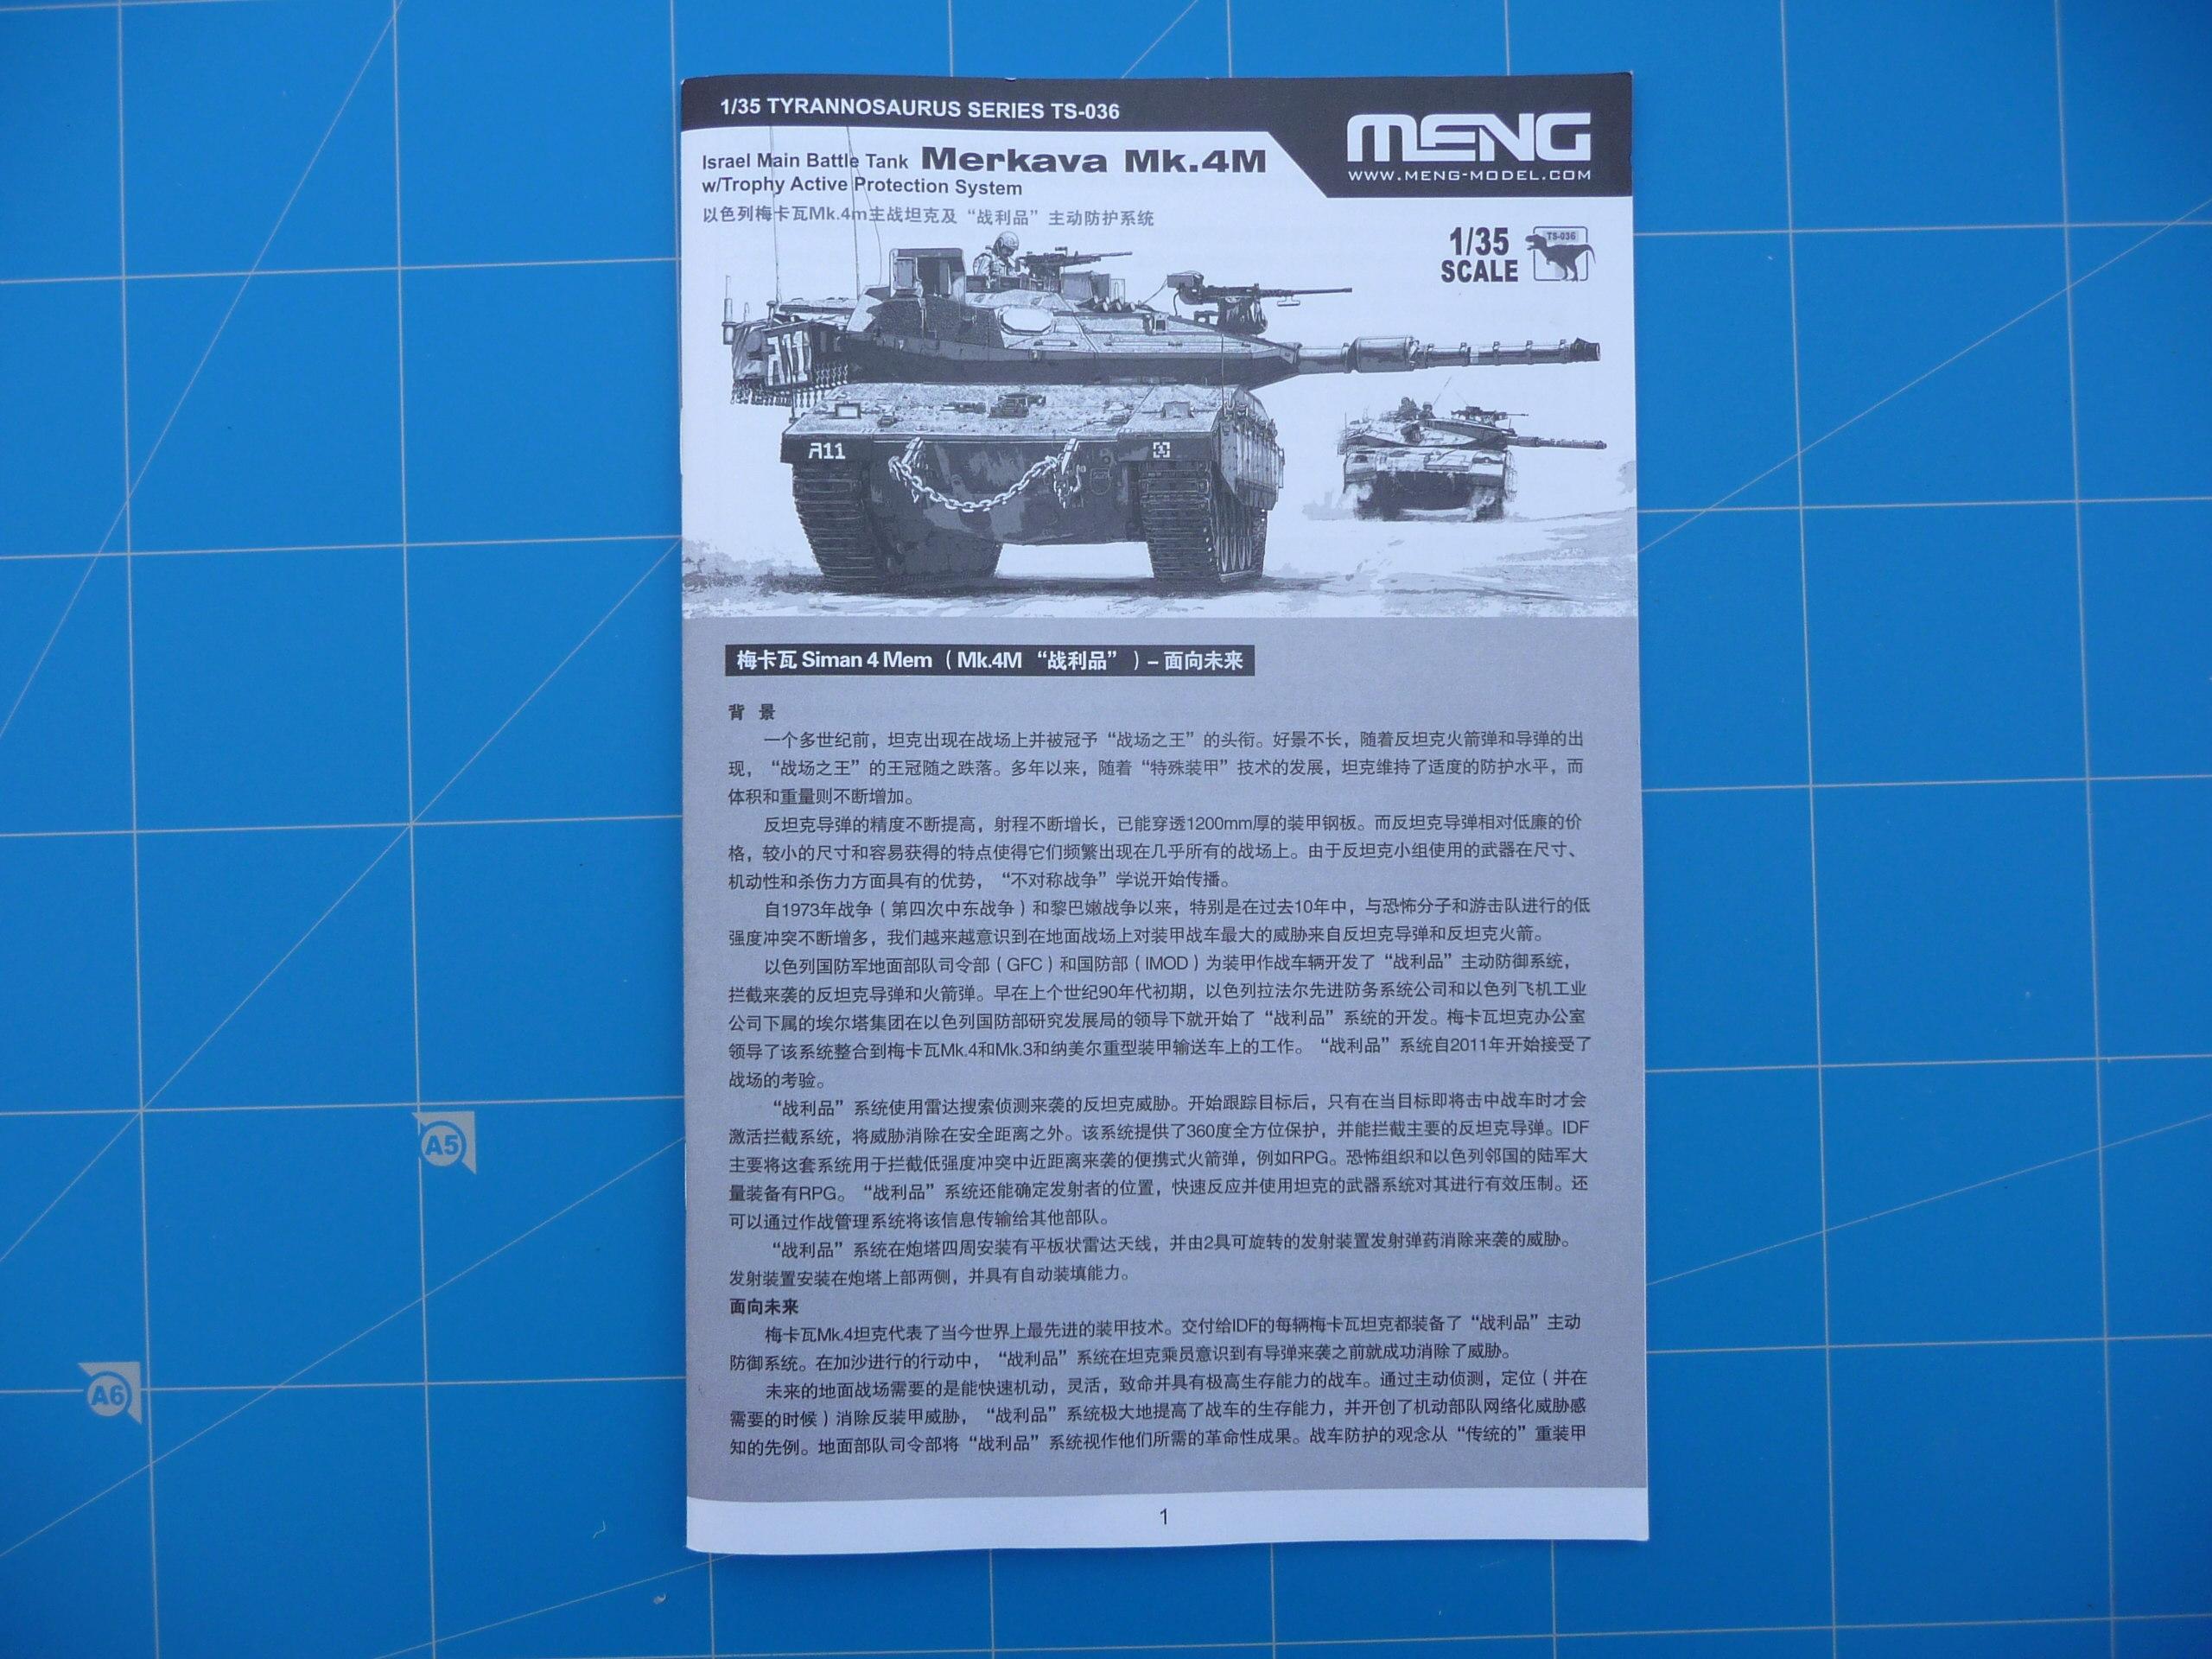 Merkava Mk.4M w/Trophy Active Protection System 1/35 ( Meng TS-036 ) P1260540